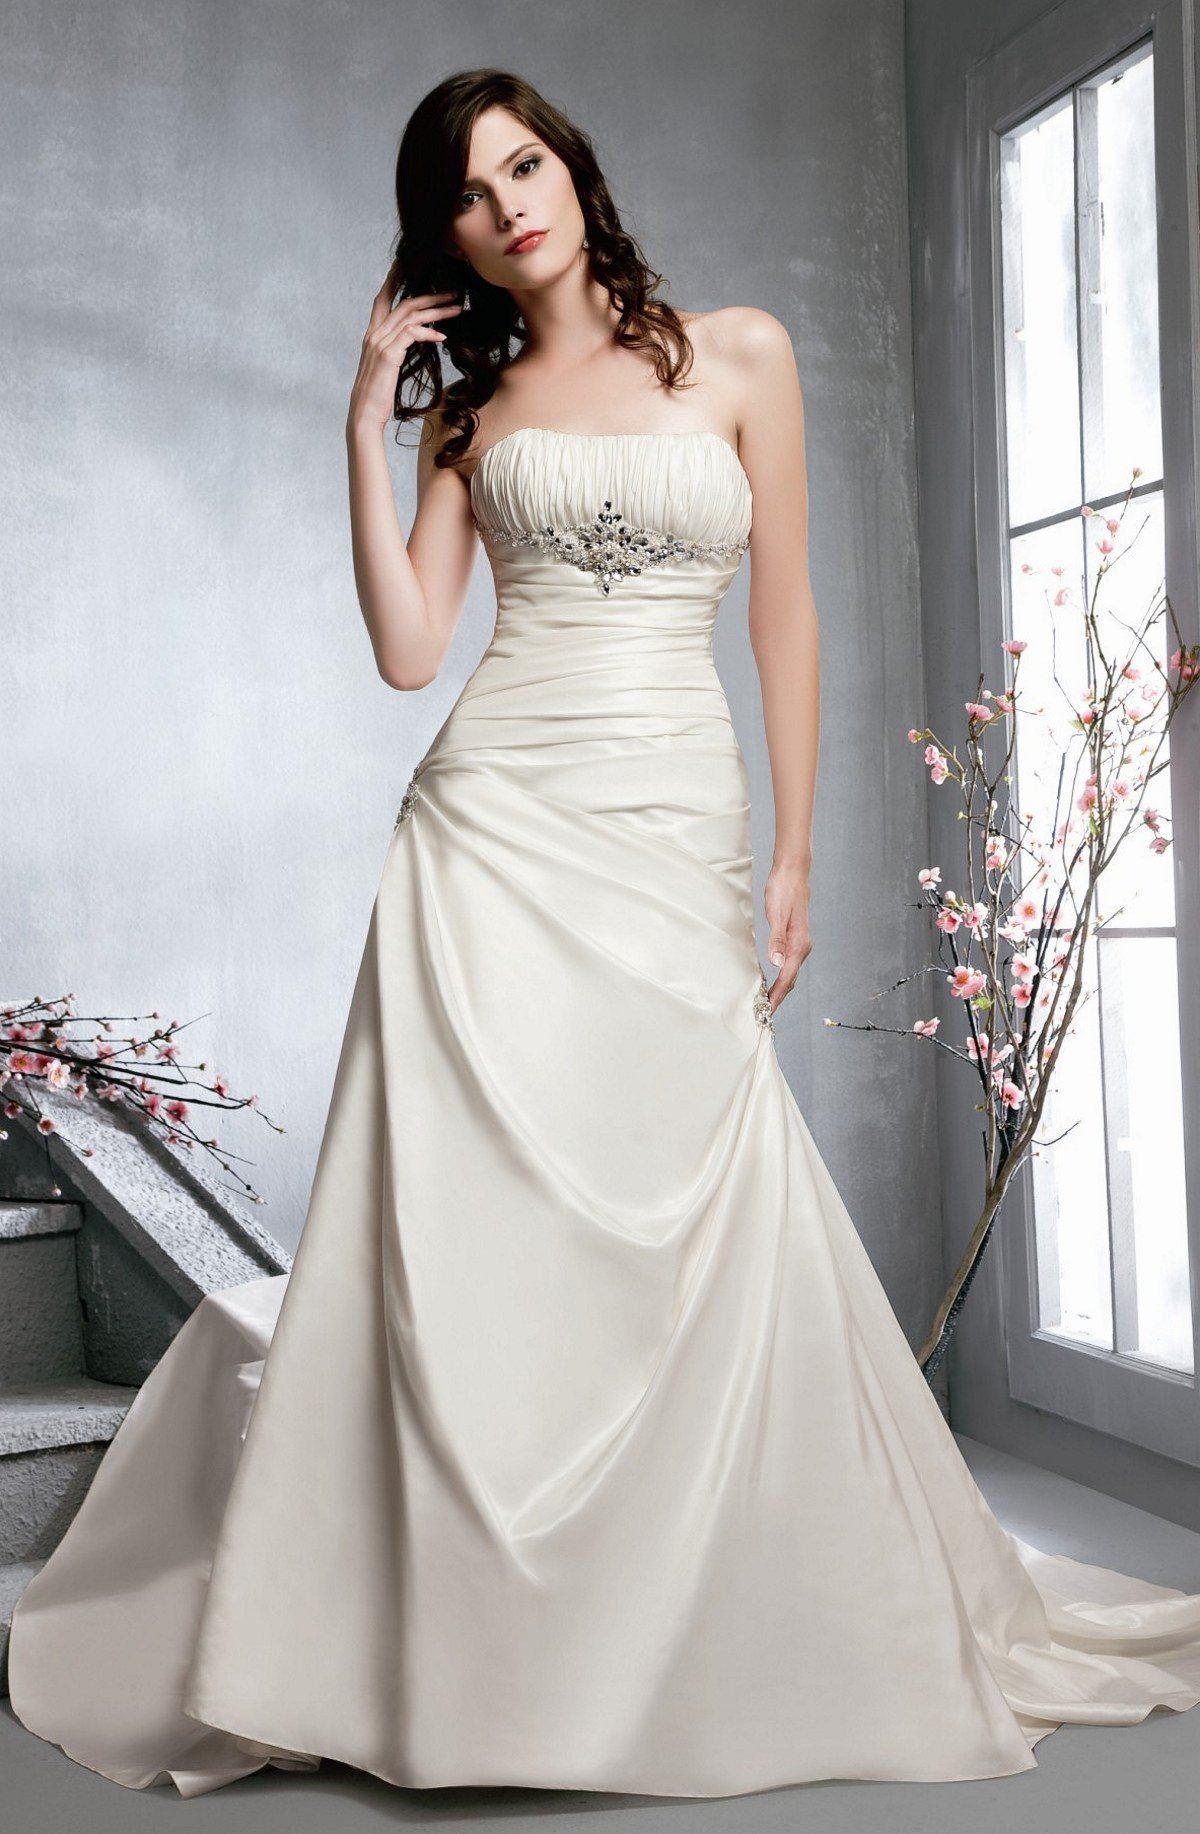 42 New Wedding Dresses just arrived